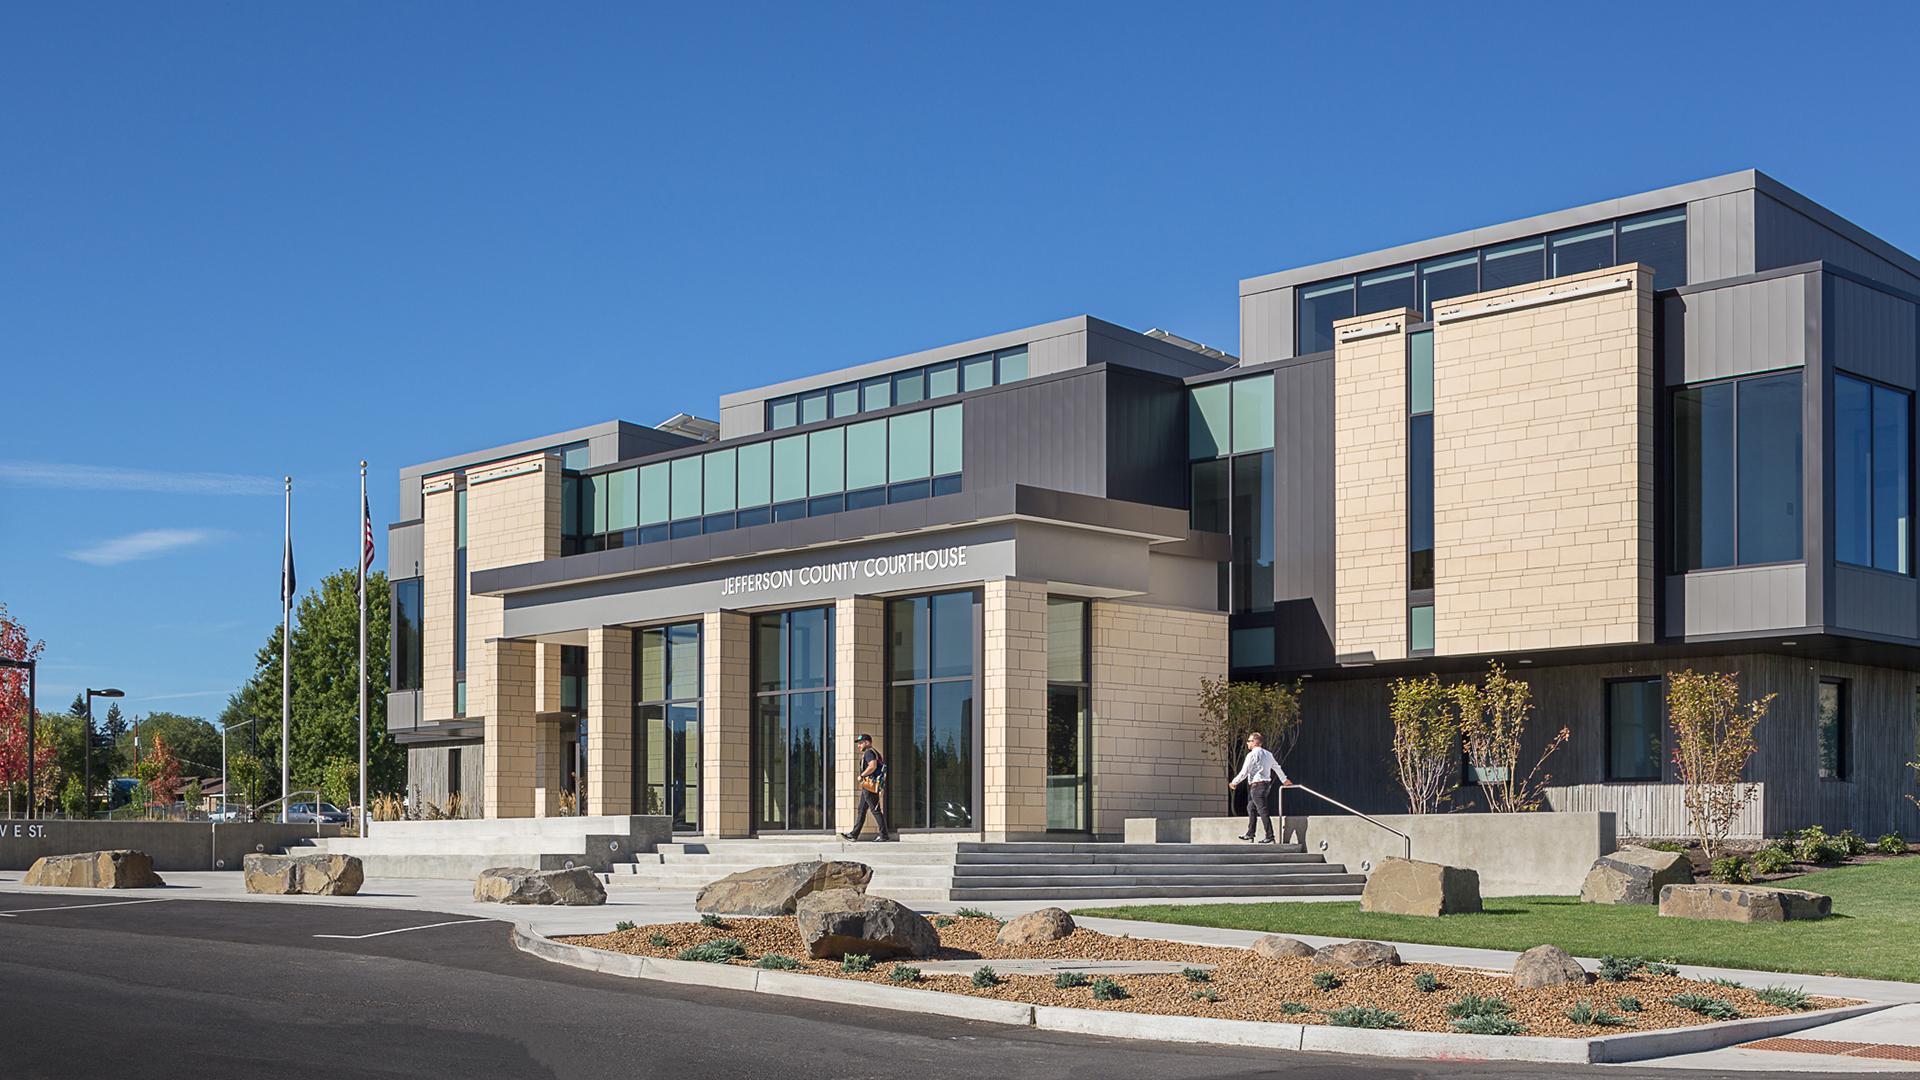 jefferson county new courthouse www usa skanska com rh usa skanska com newcourt house exeter hospital new court house belfast